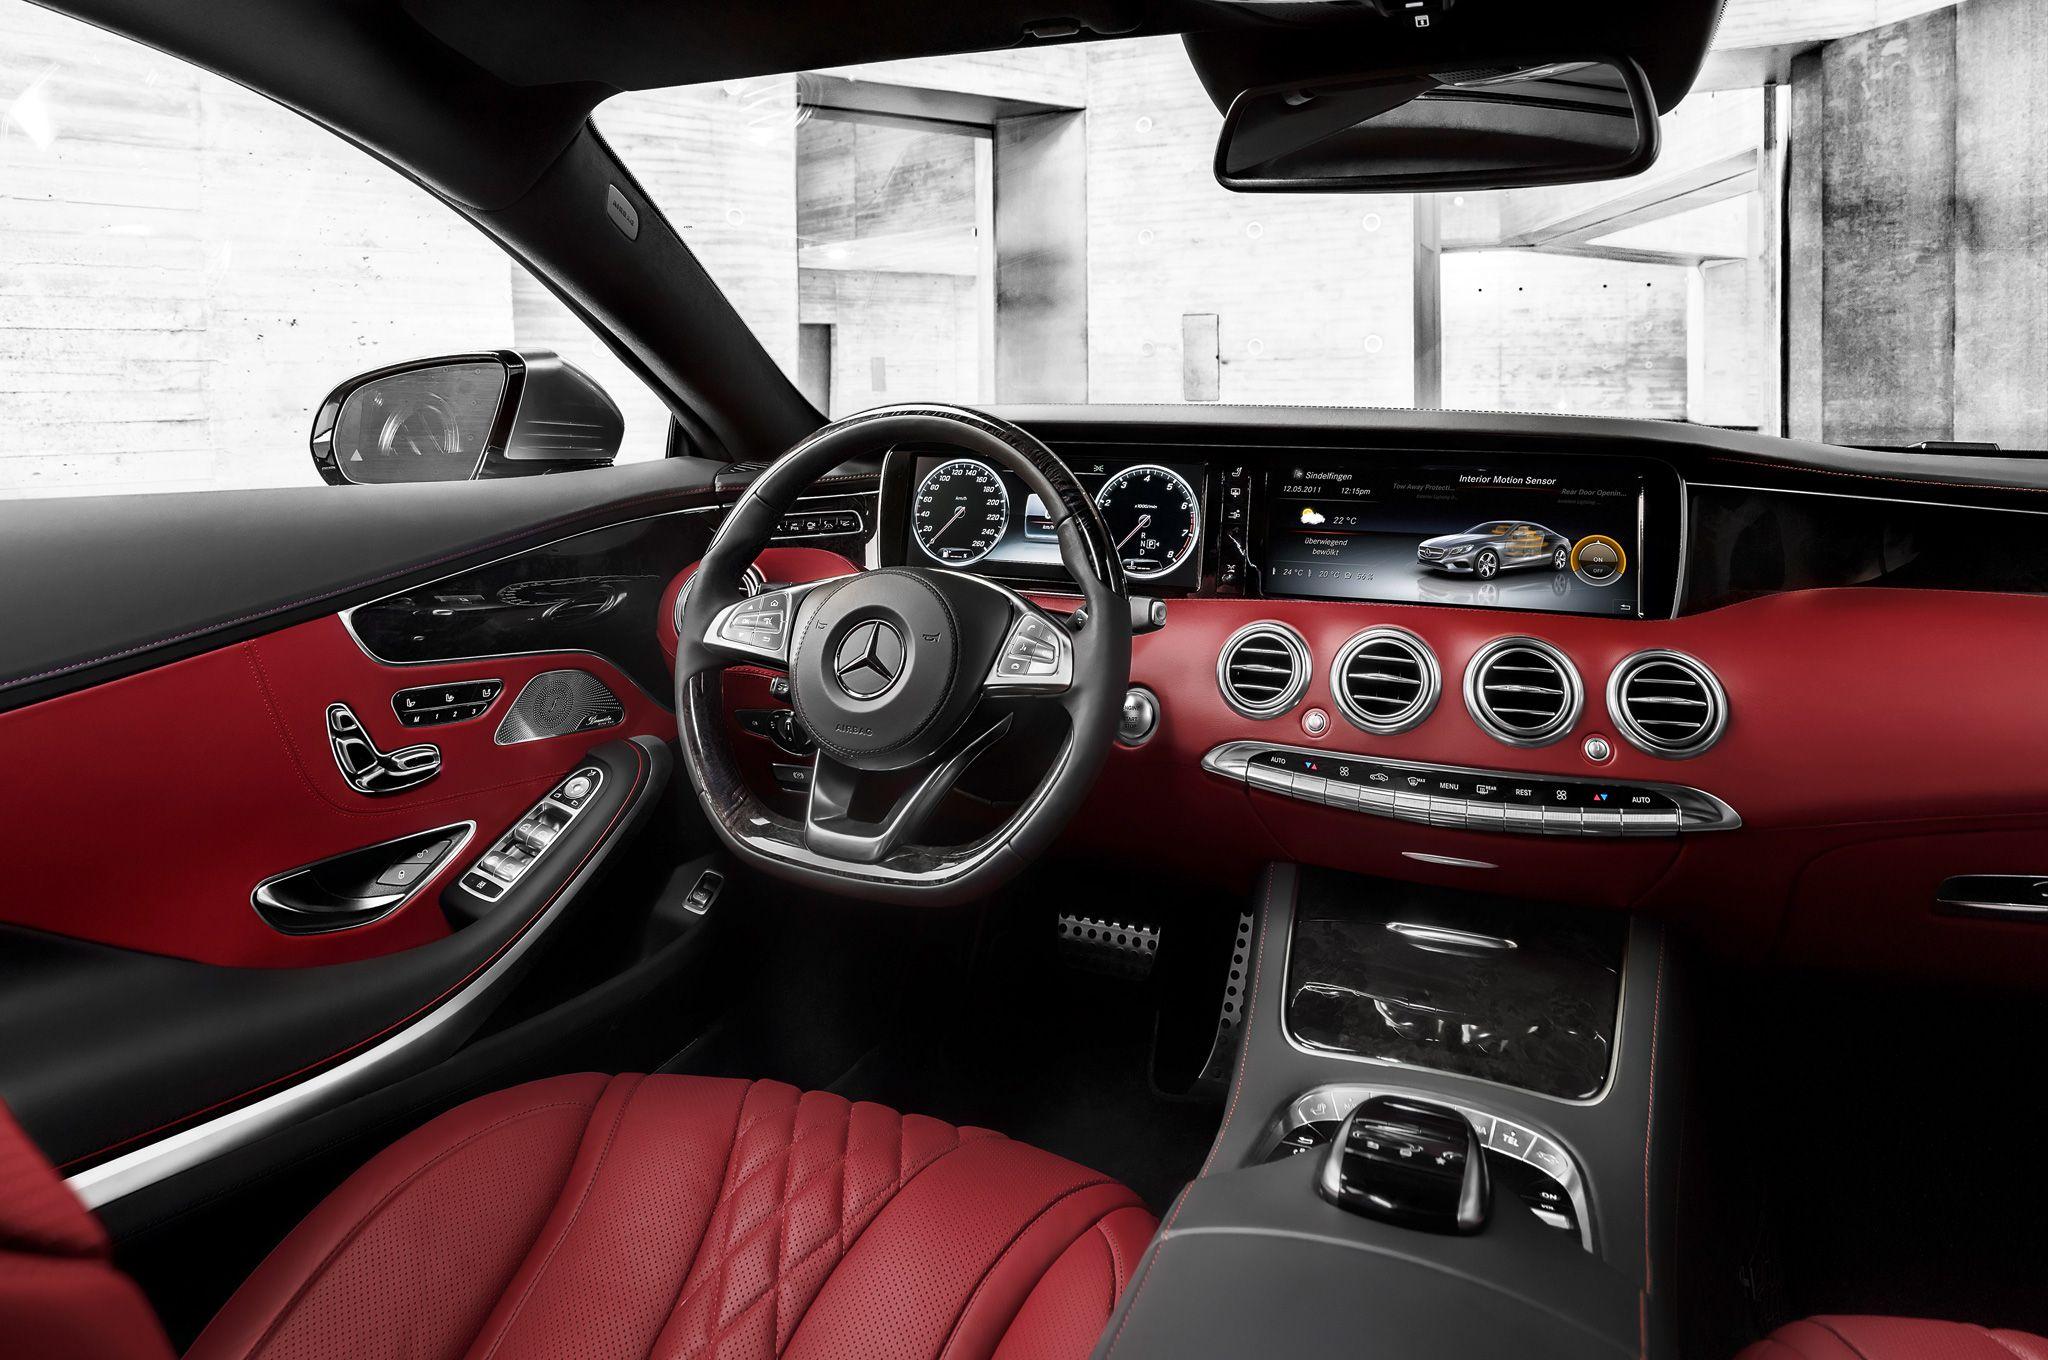 2015 Mercedes Benz S Class Coupe First Look Mercedes S Class